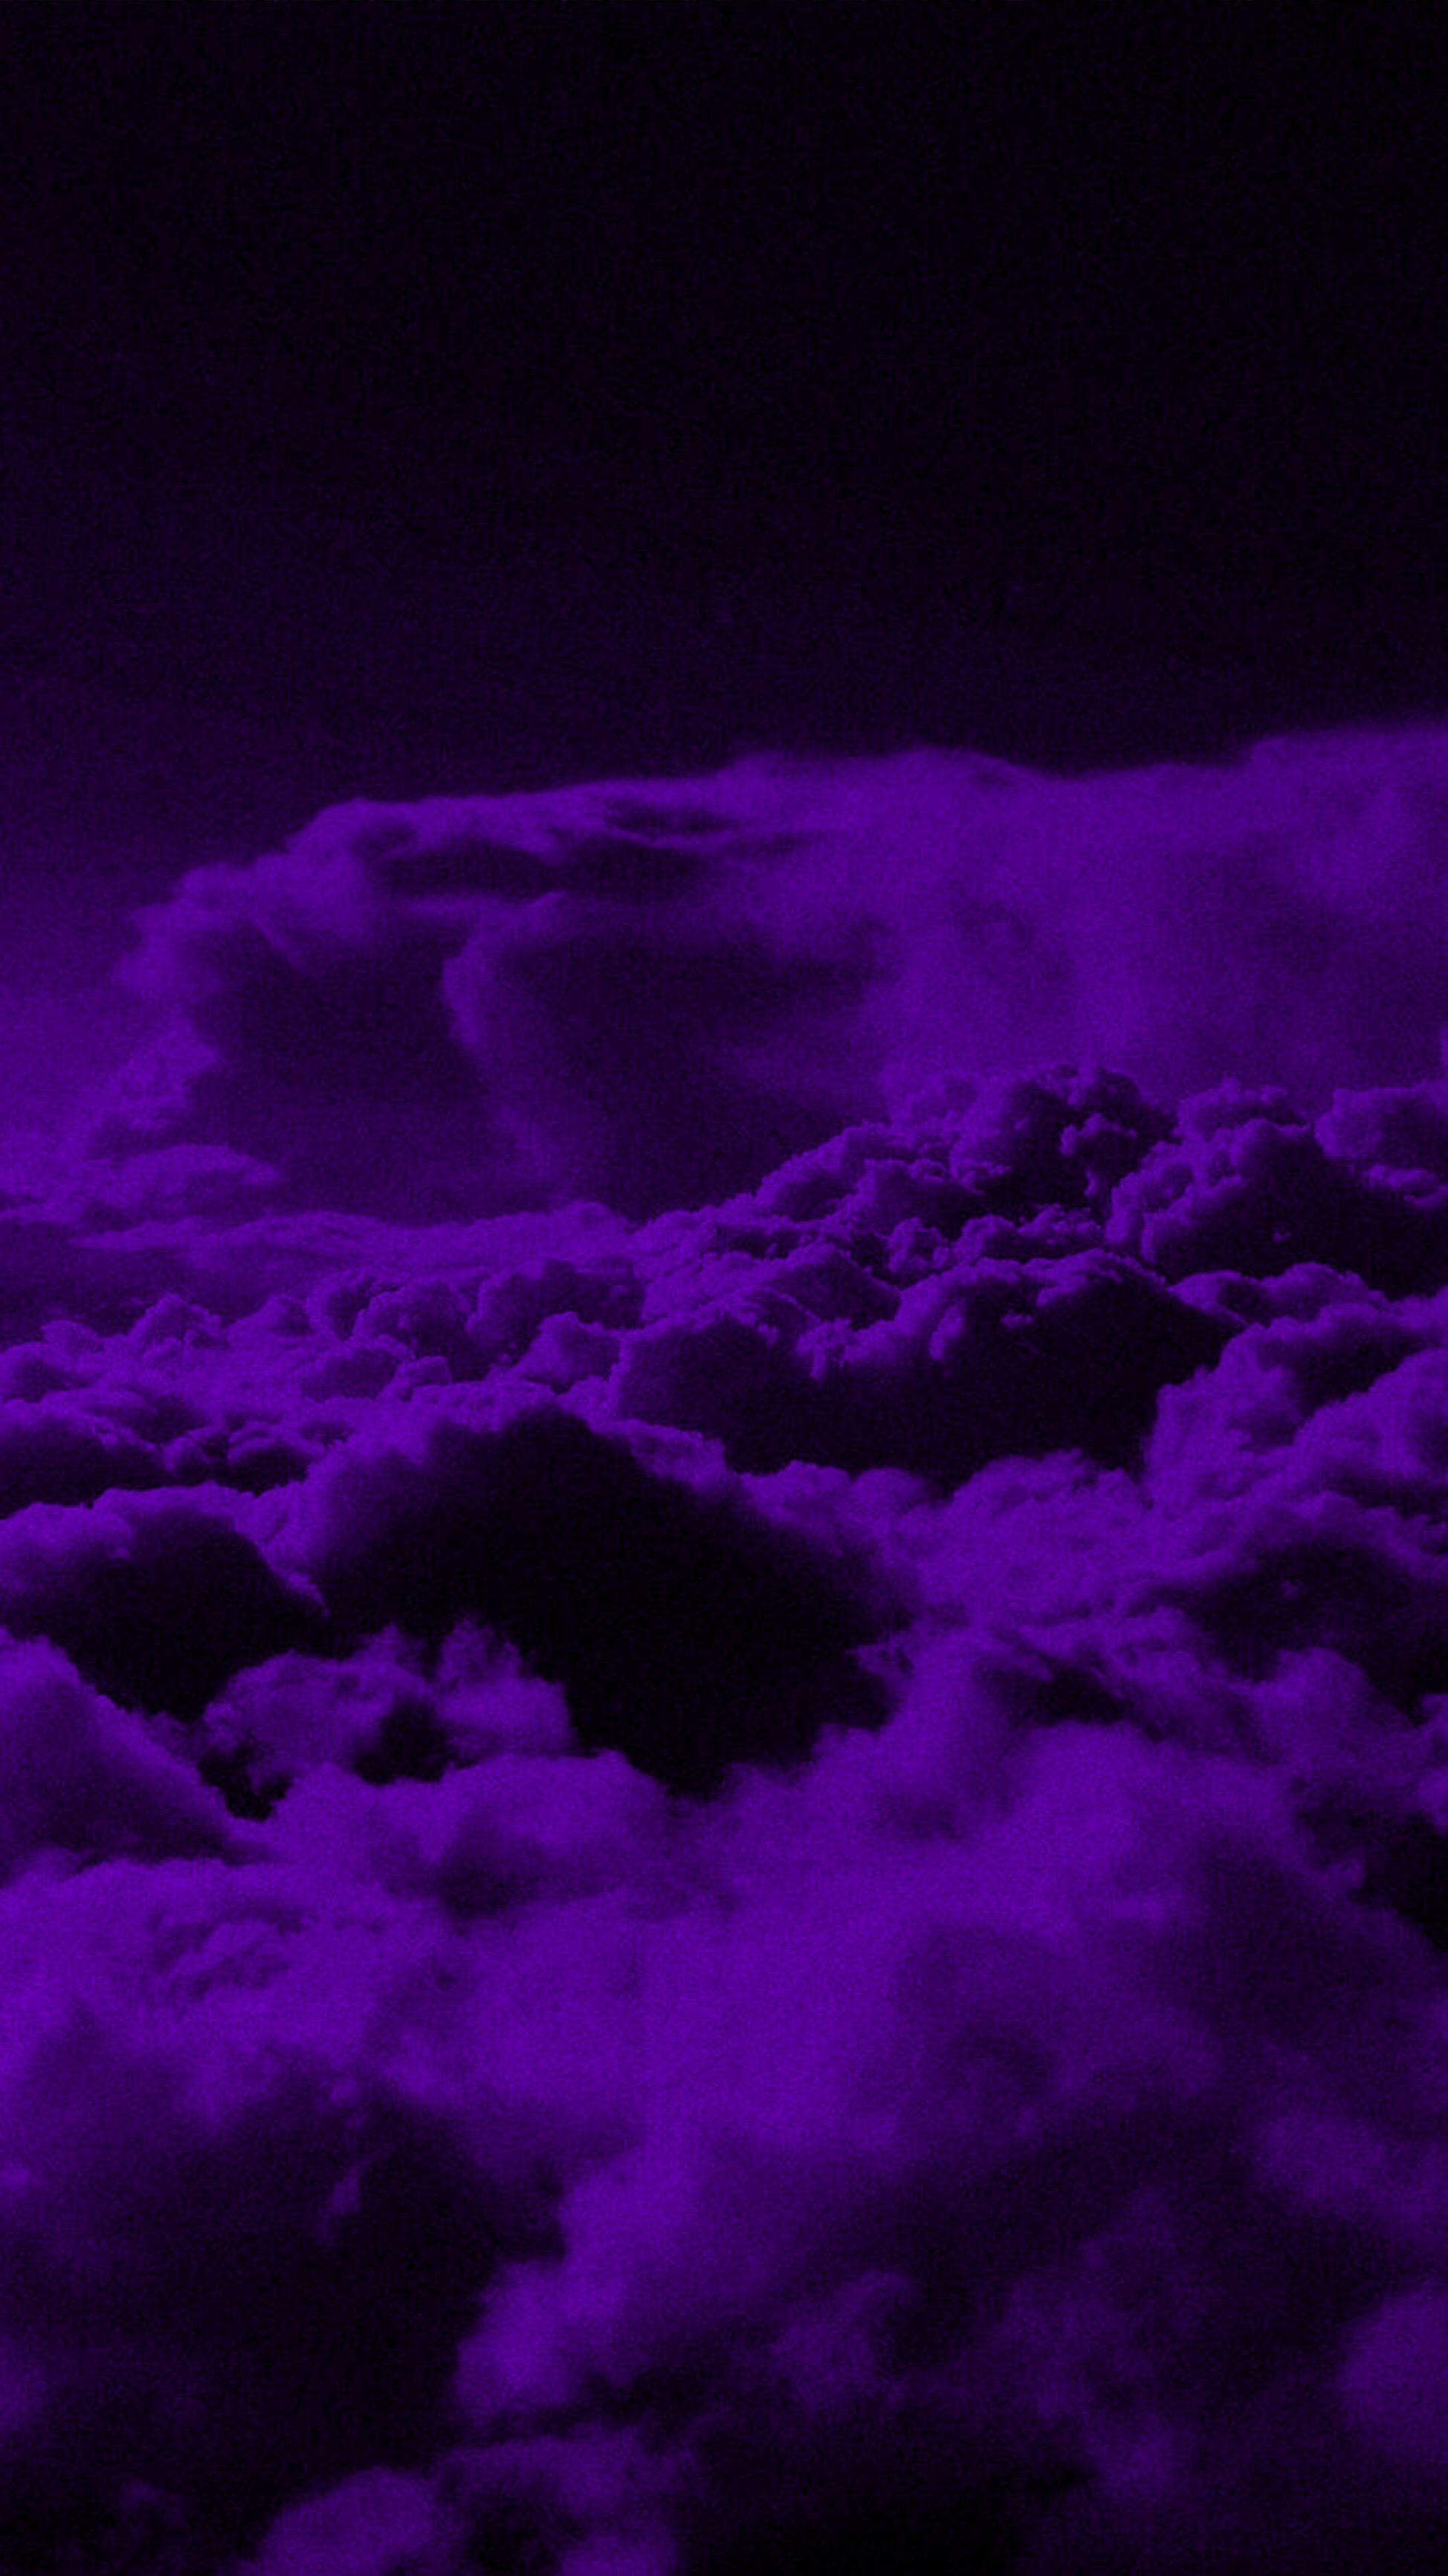 Purple Aesthetic Discover Purple Sky Wallpaper Background Dark Purple Aesthetic Dark Purple Wallpaper Purple Aesthetic